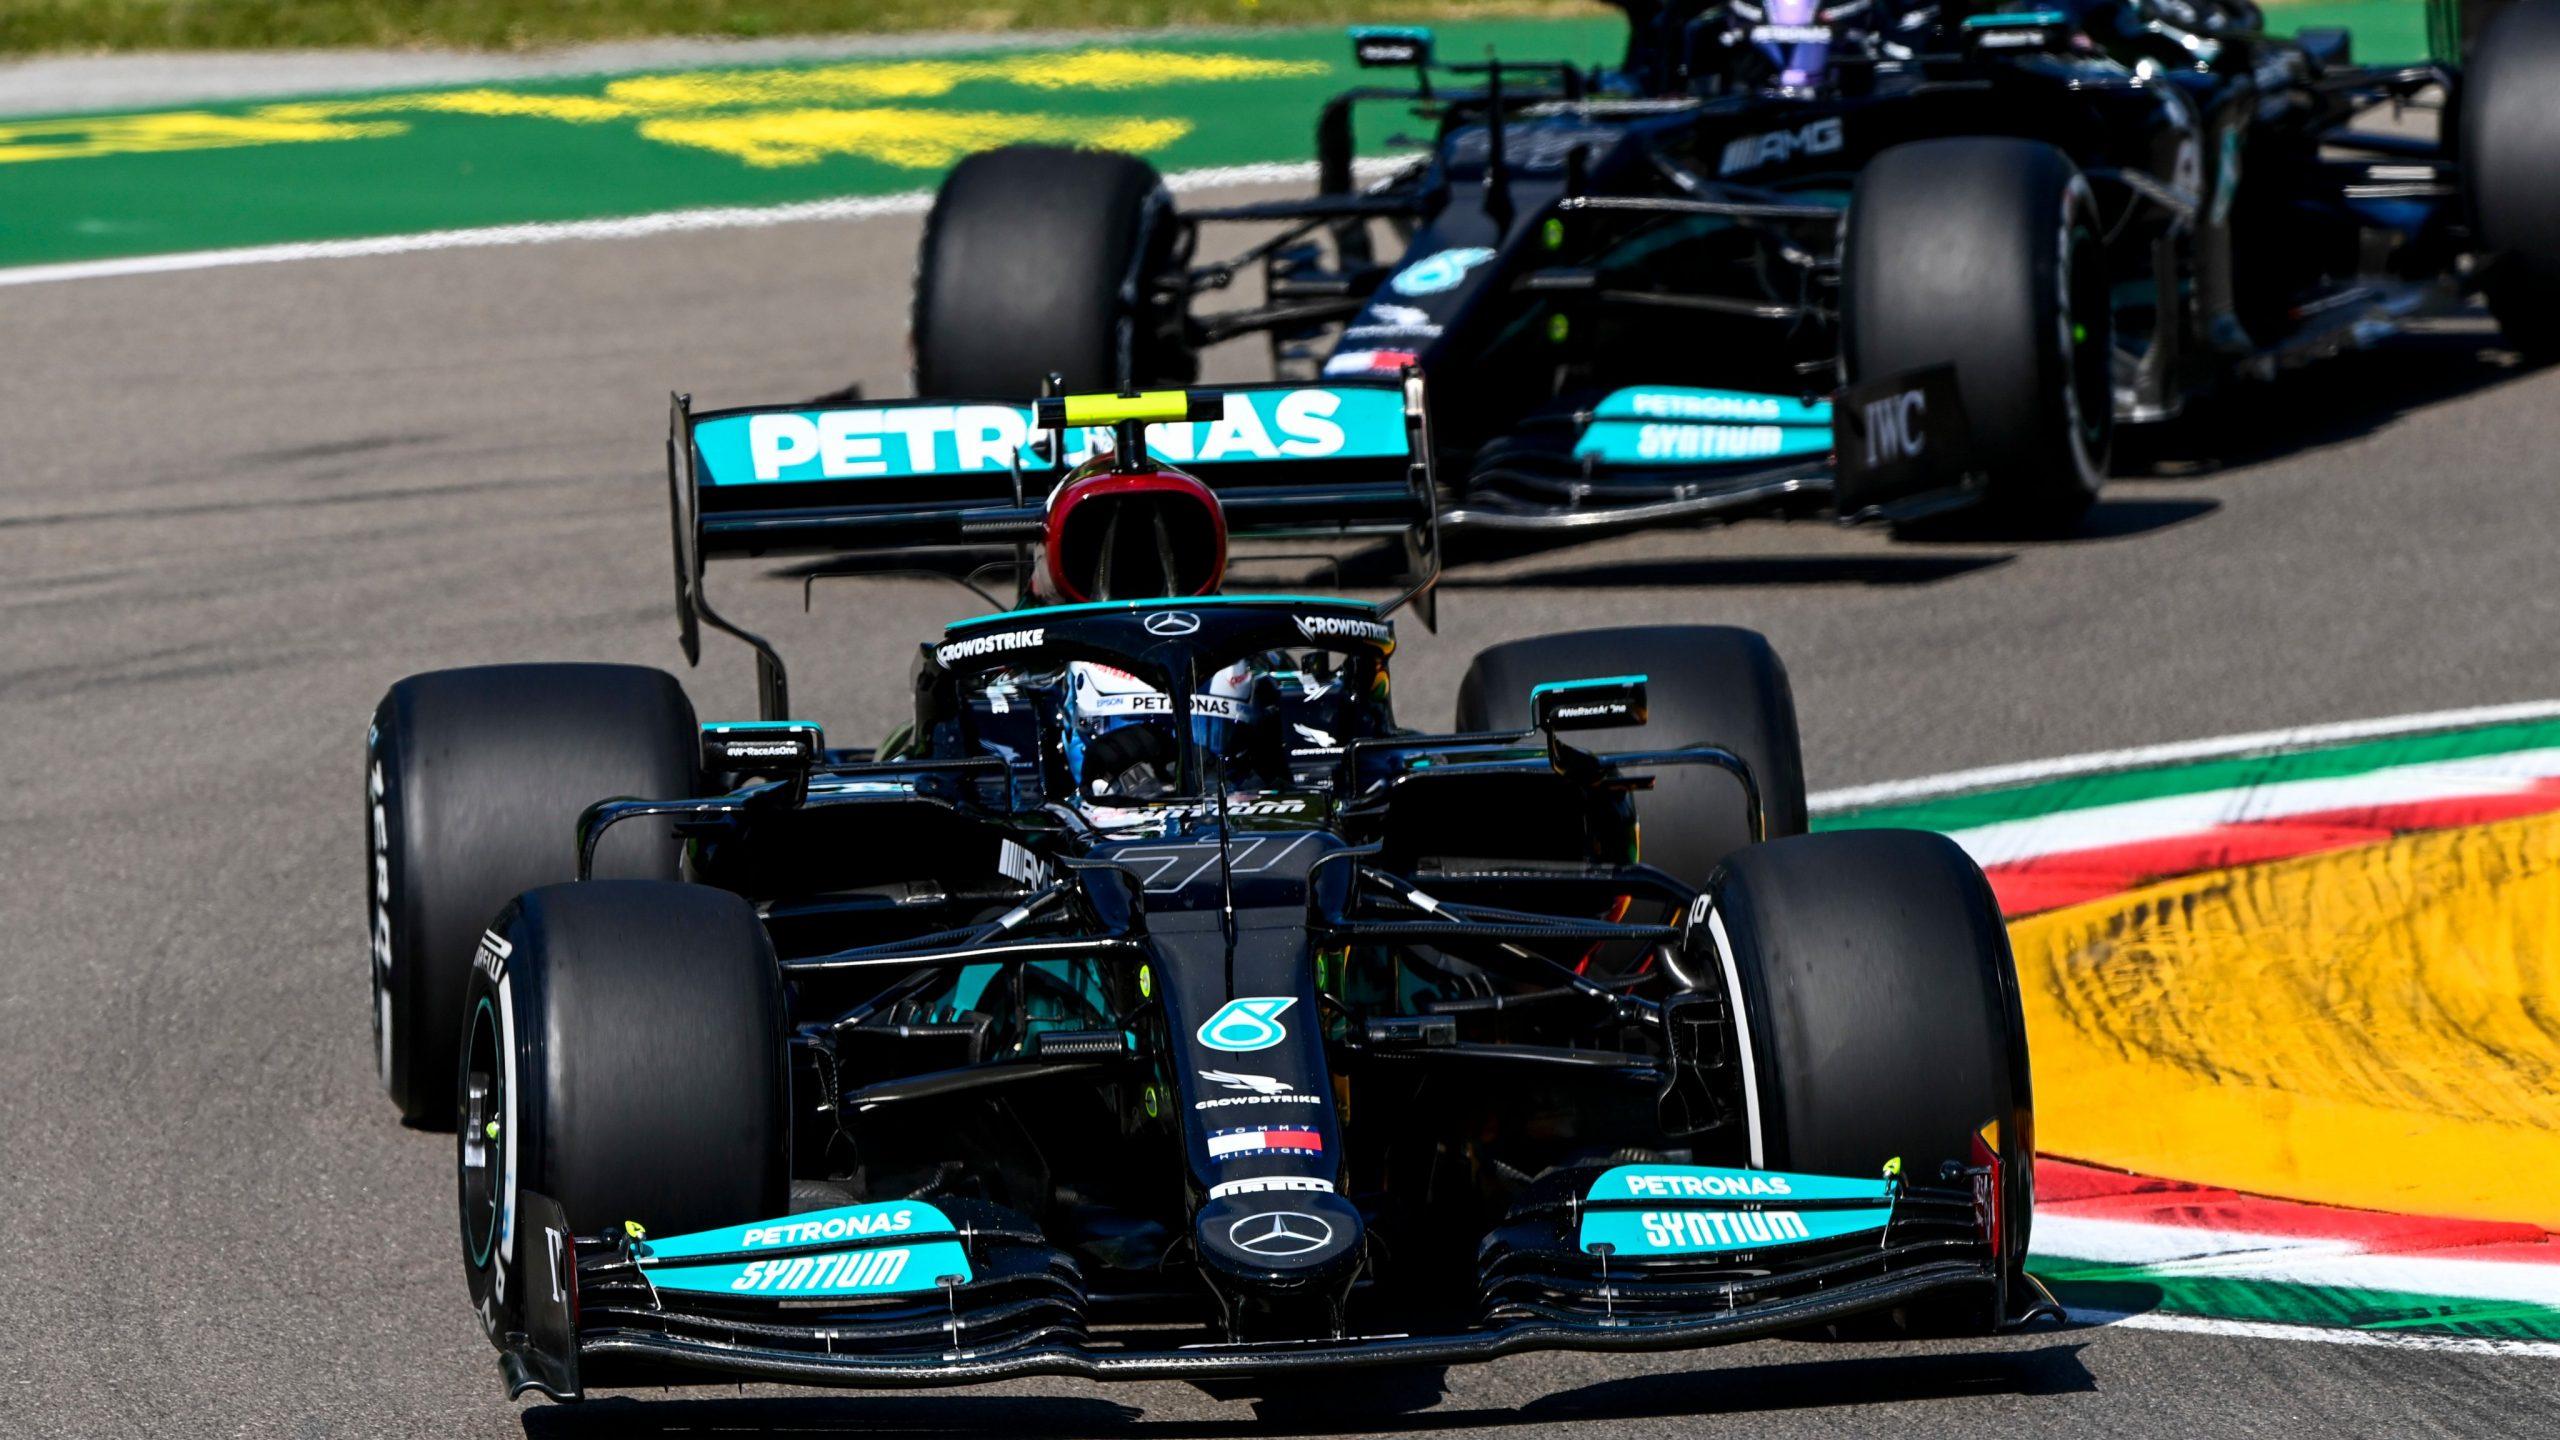 Valtteri Bottas lidera la primera sesión libre en Imola